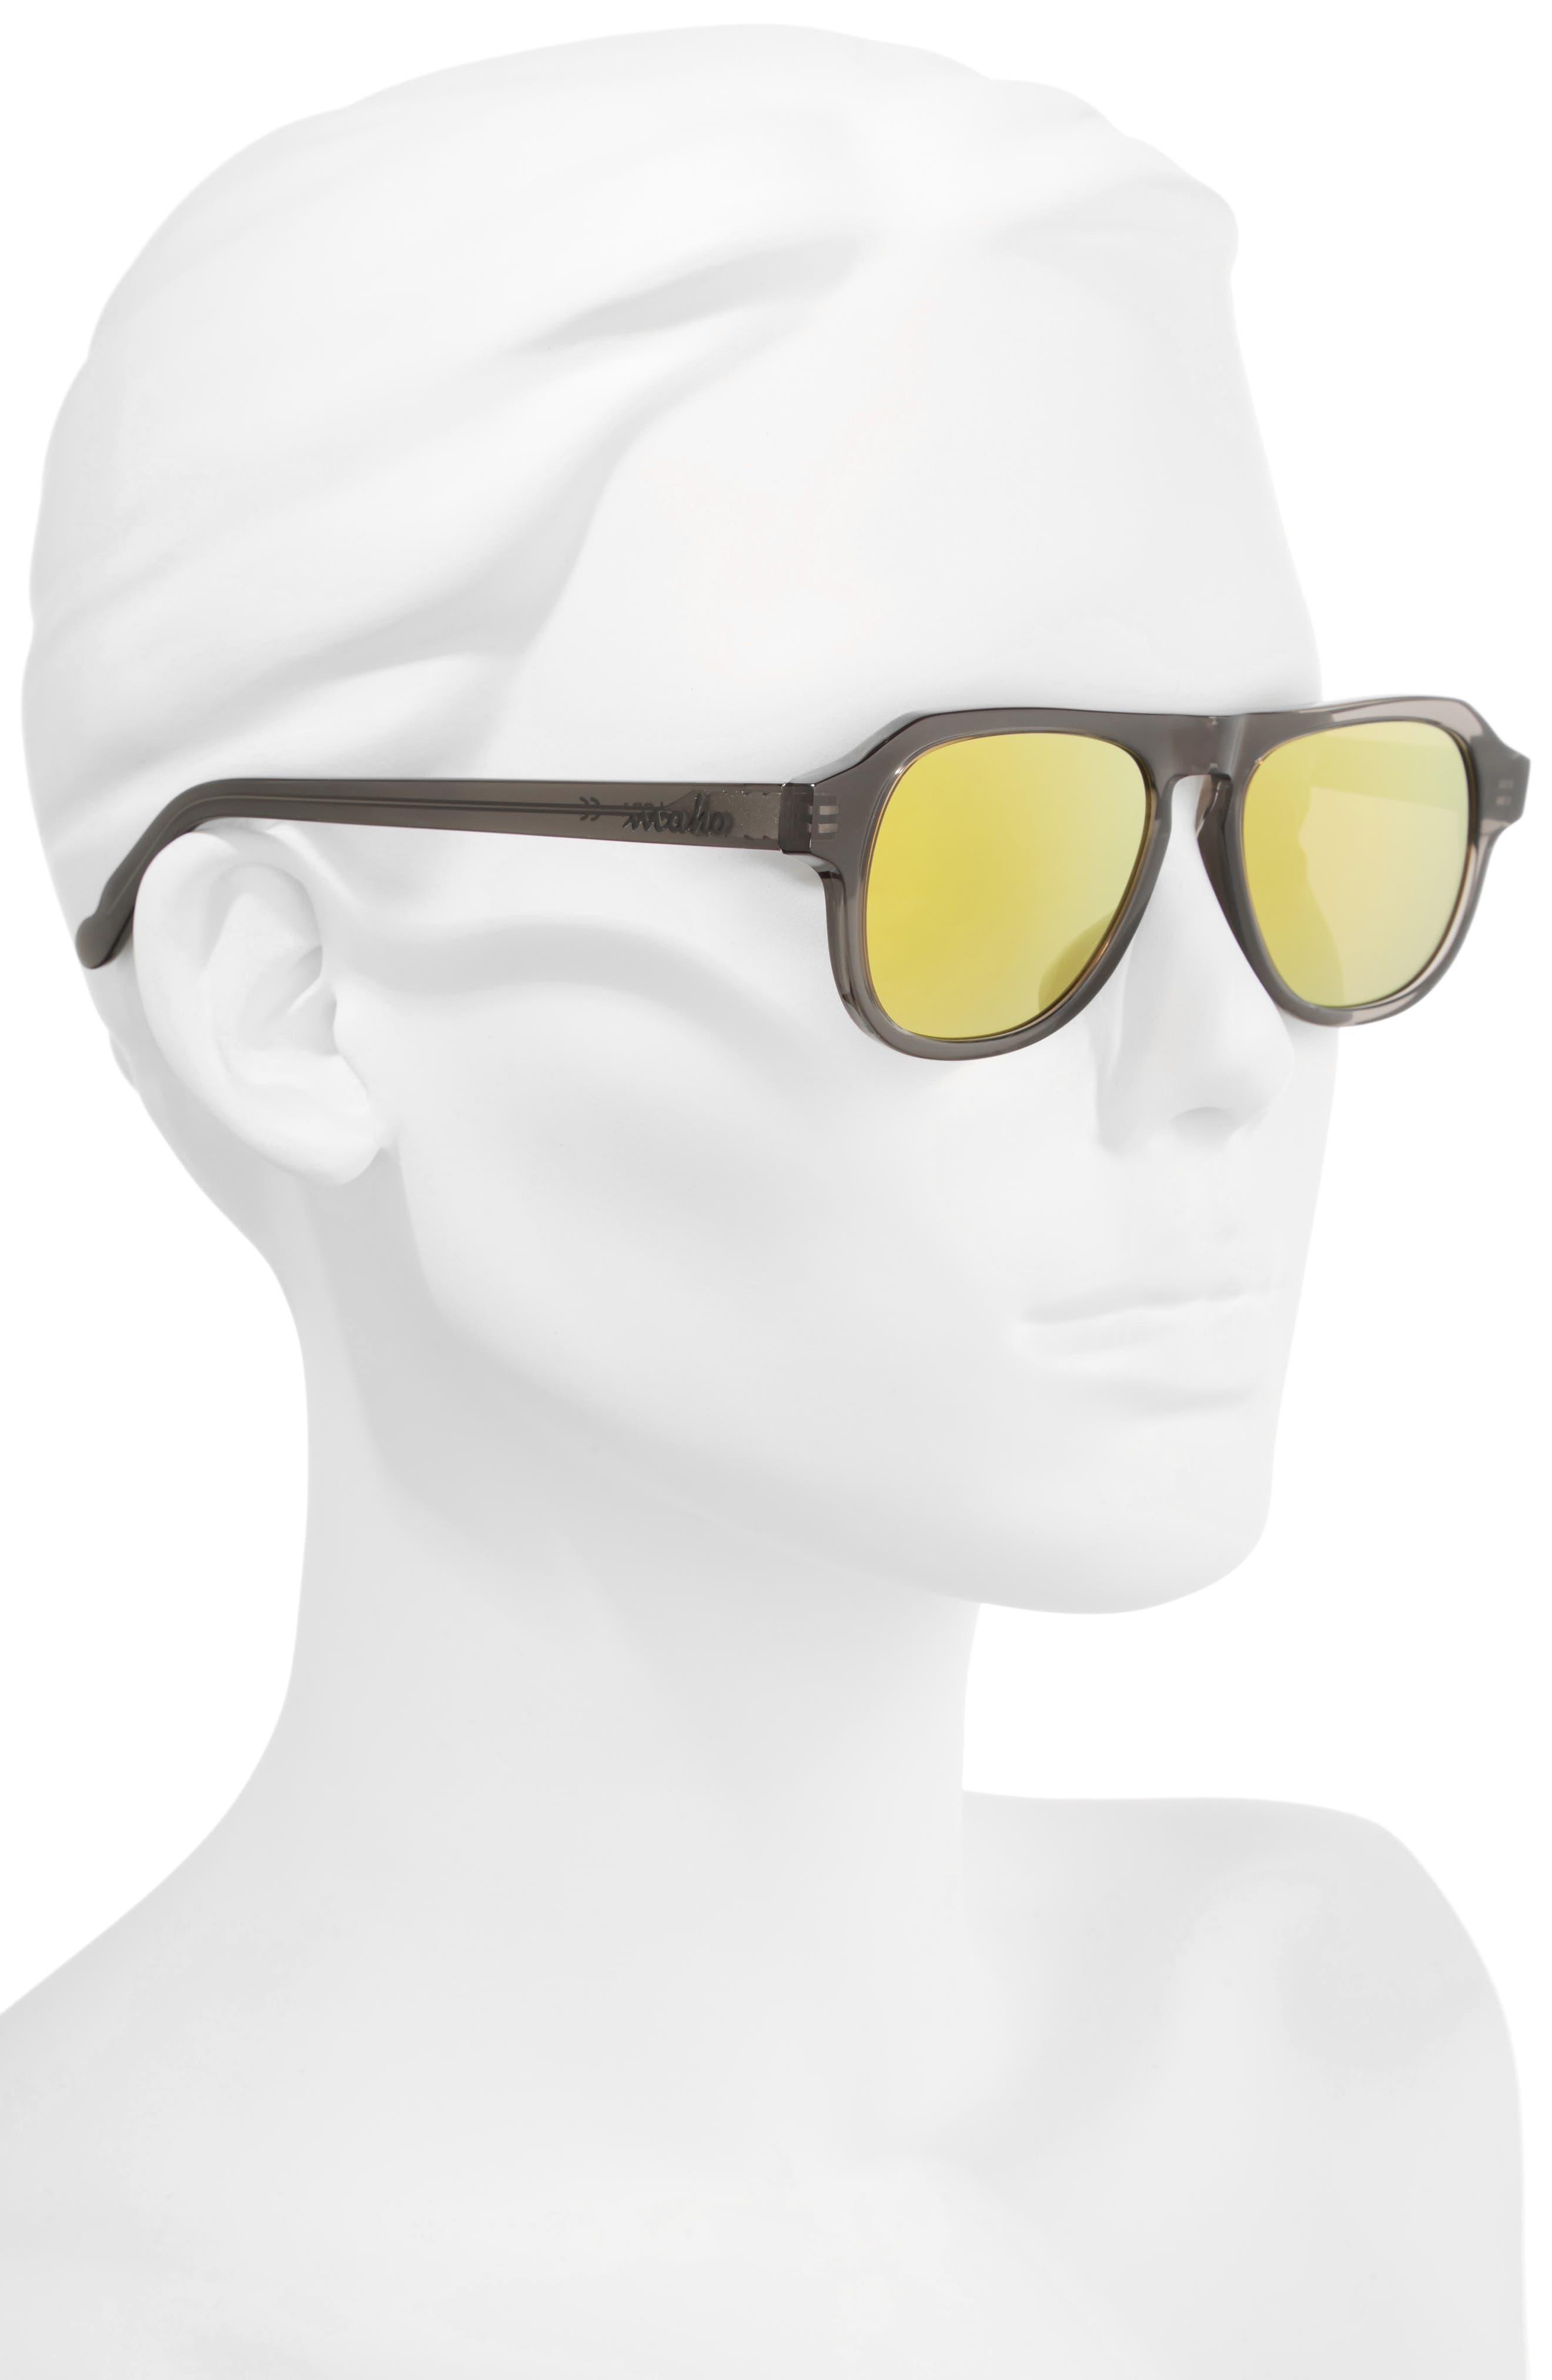 Galapagos 48mm Polarized Flat Top Sunglasses,                             Alternate thumbnail 2, color,                             020